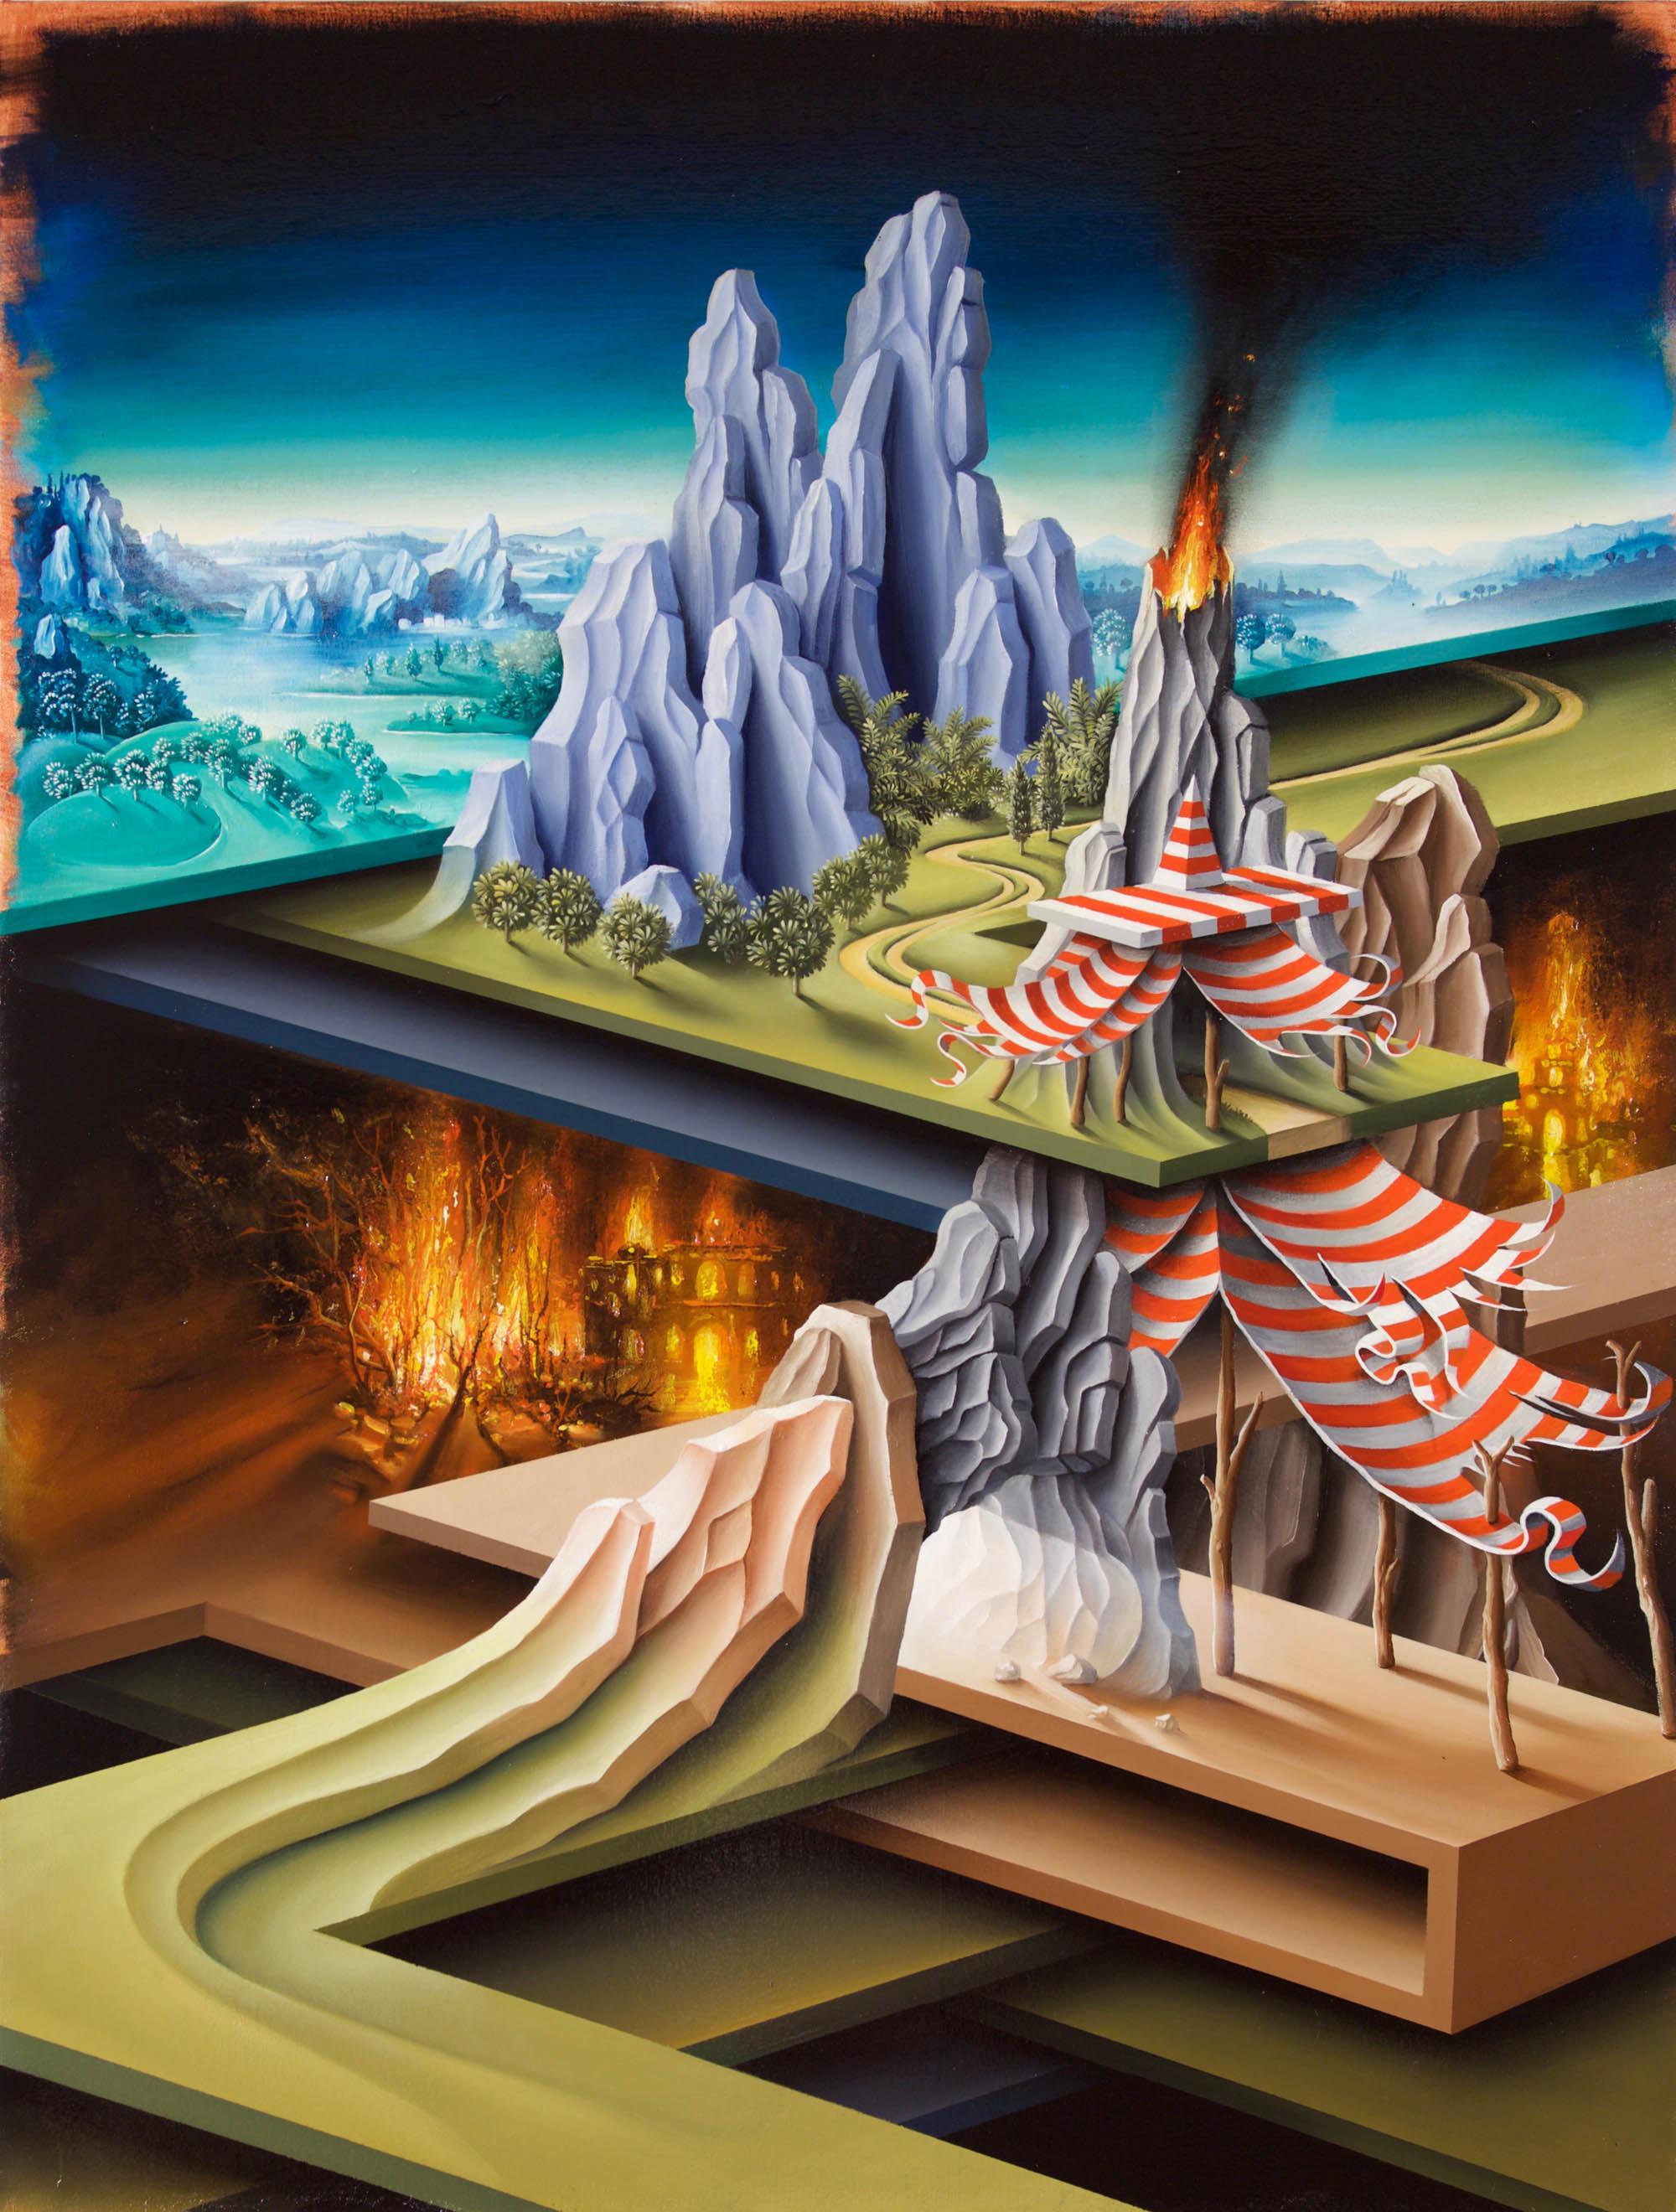 PETER DAVERINGTON   Jacob's Tent on his descent to the underworld  2016 Oil on linen 122 x 92 cm